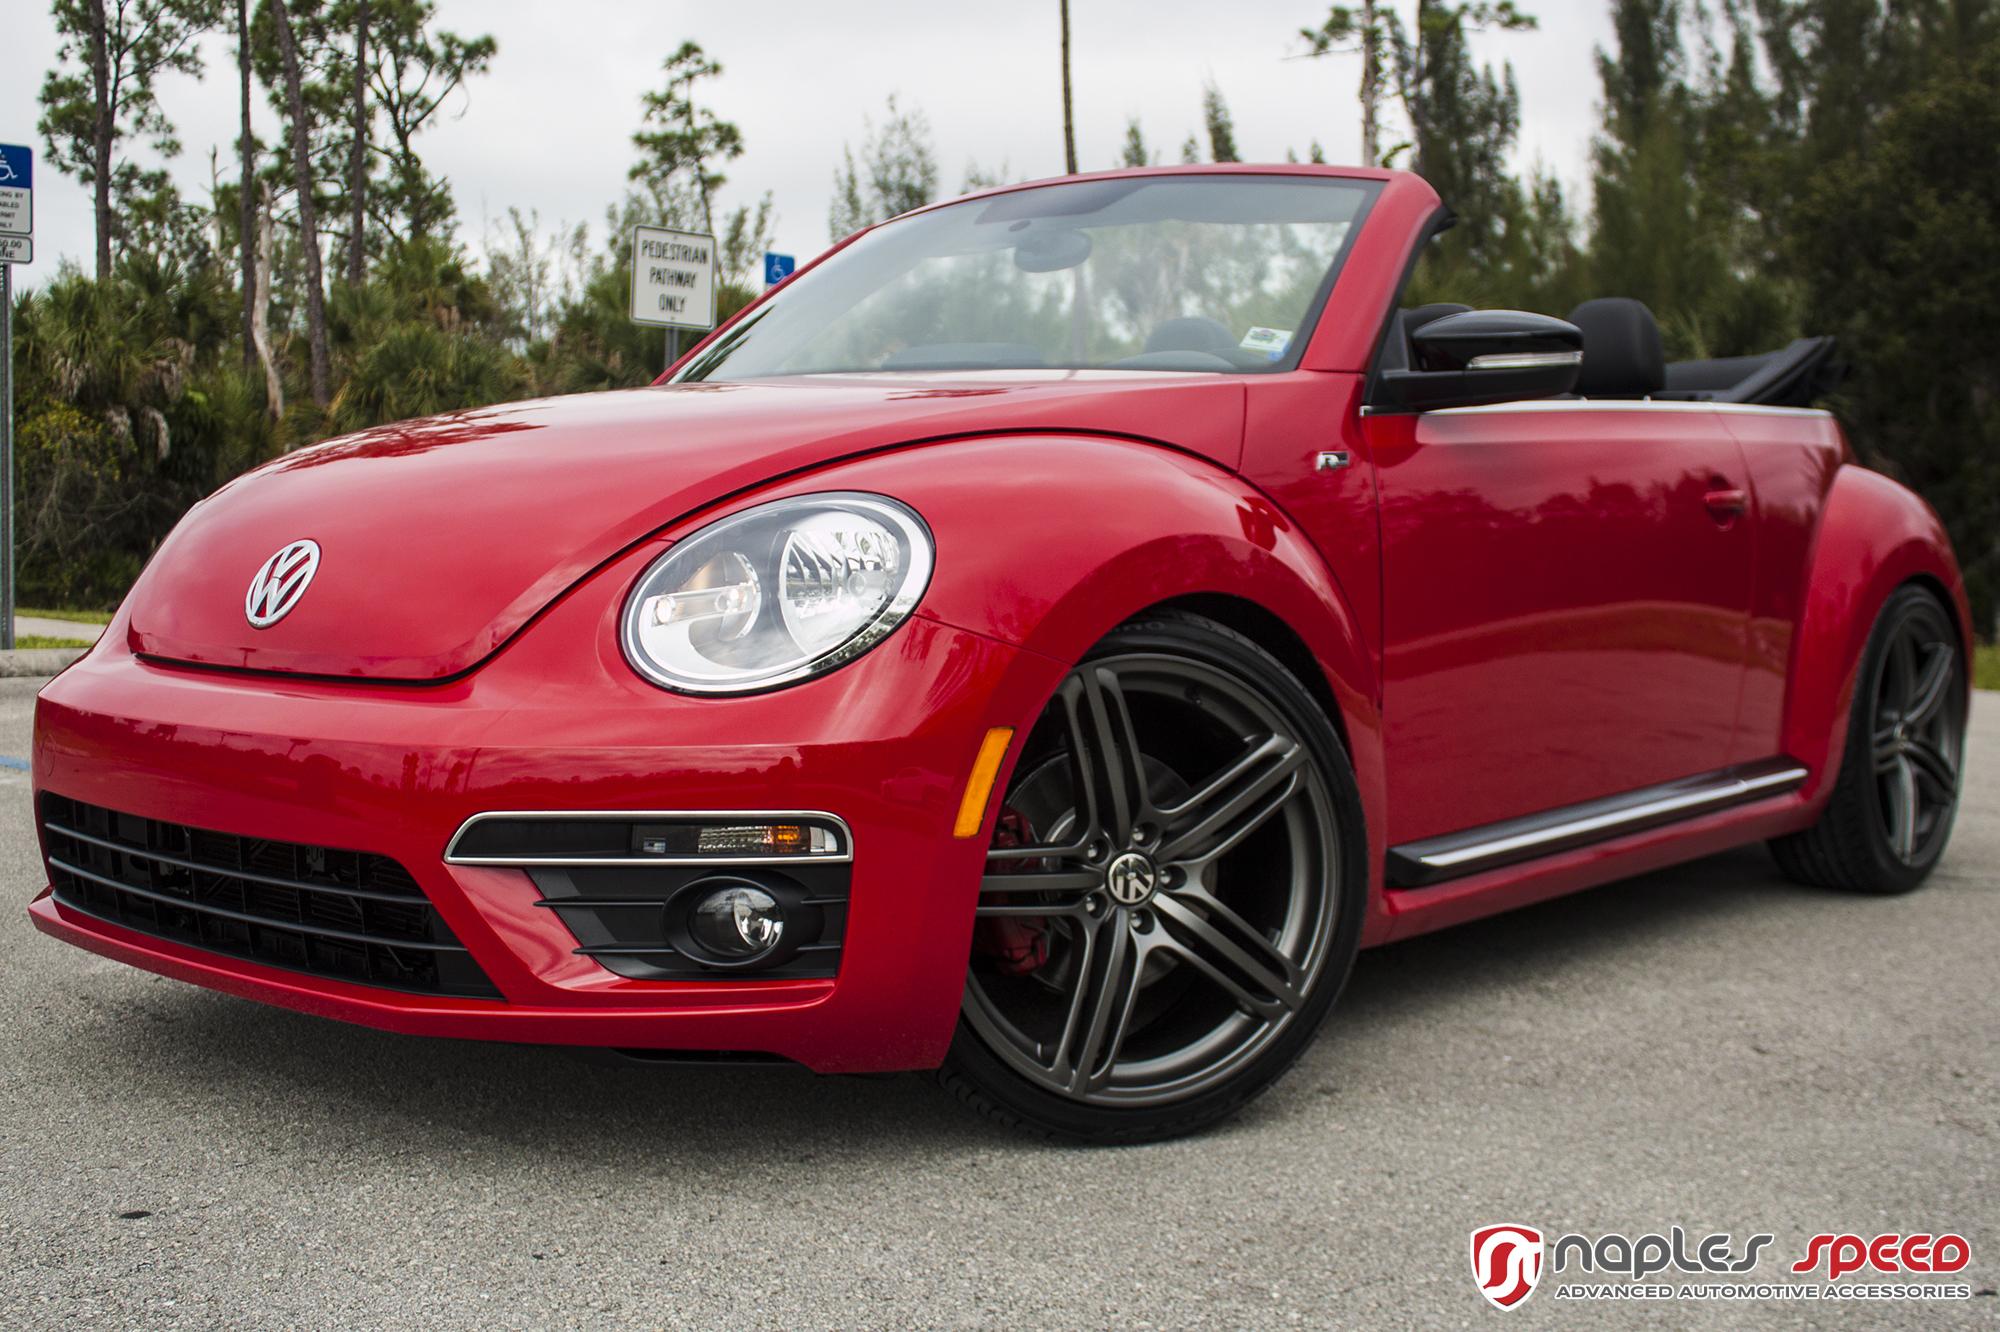 Volkswagen Beetle R-line – Advanced Automotive Accessories